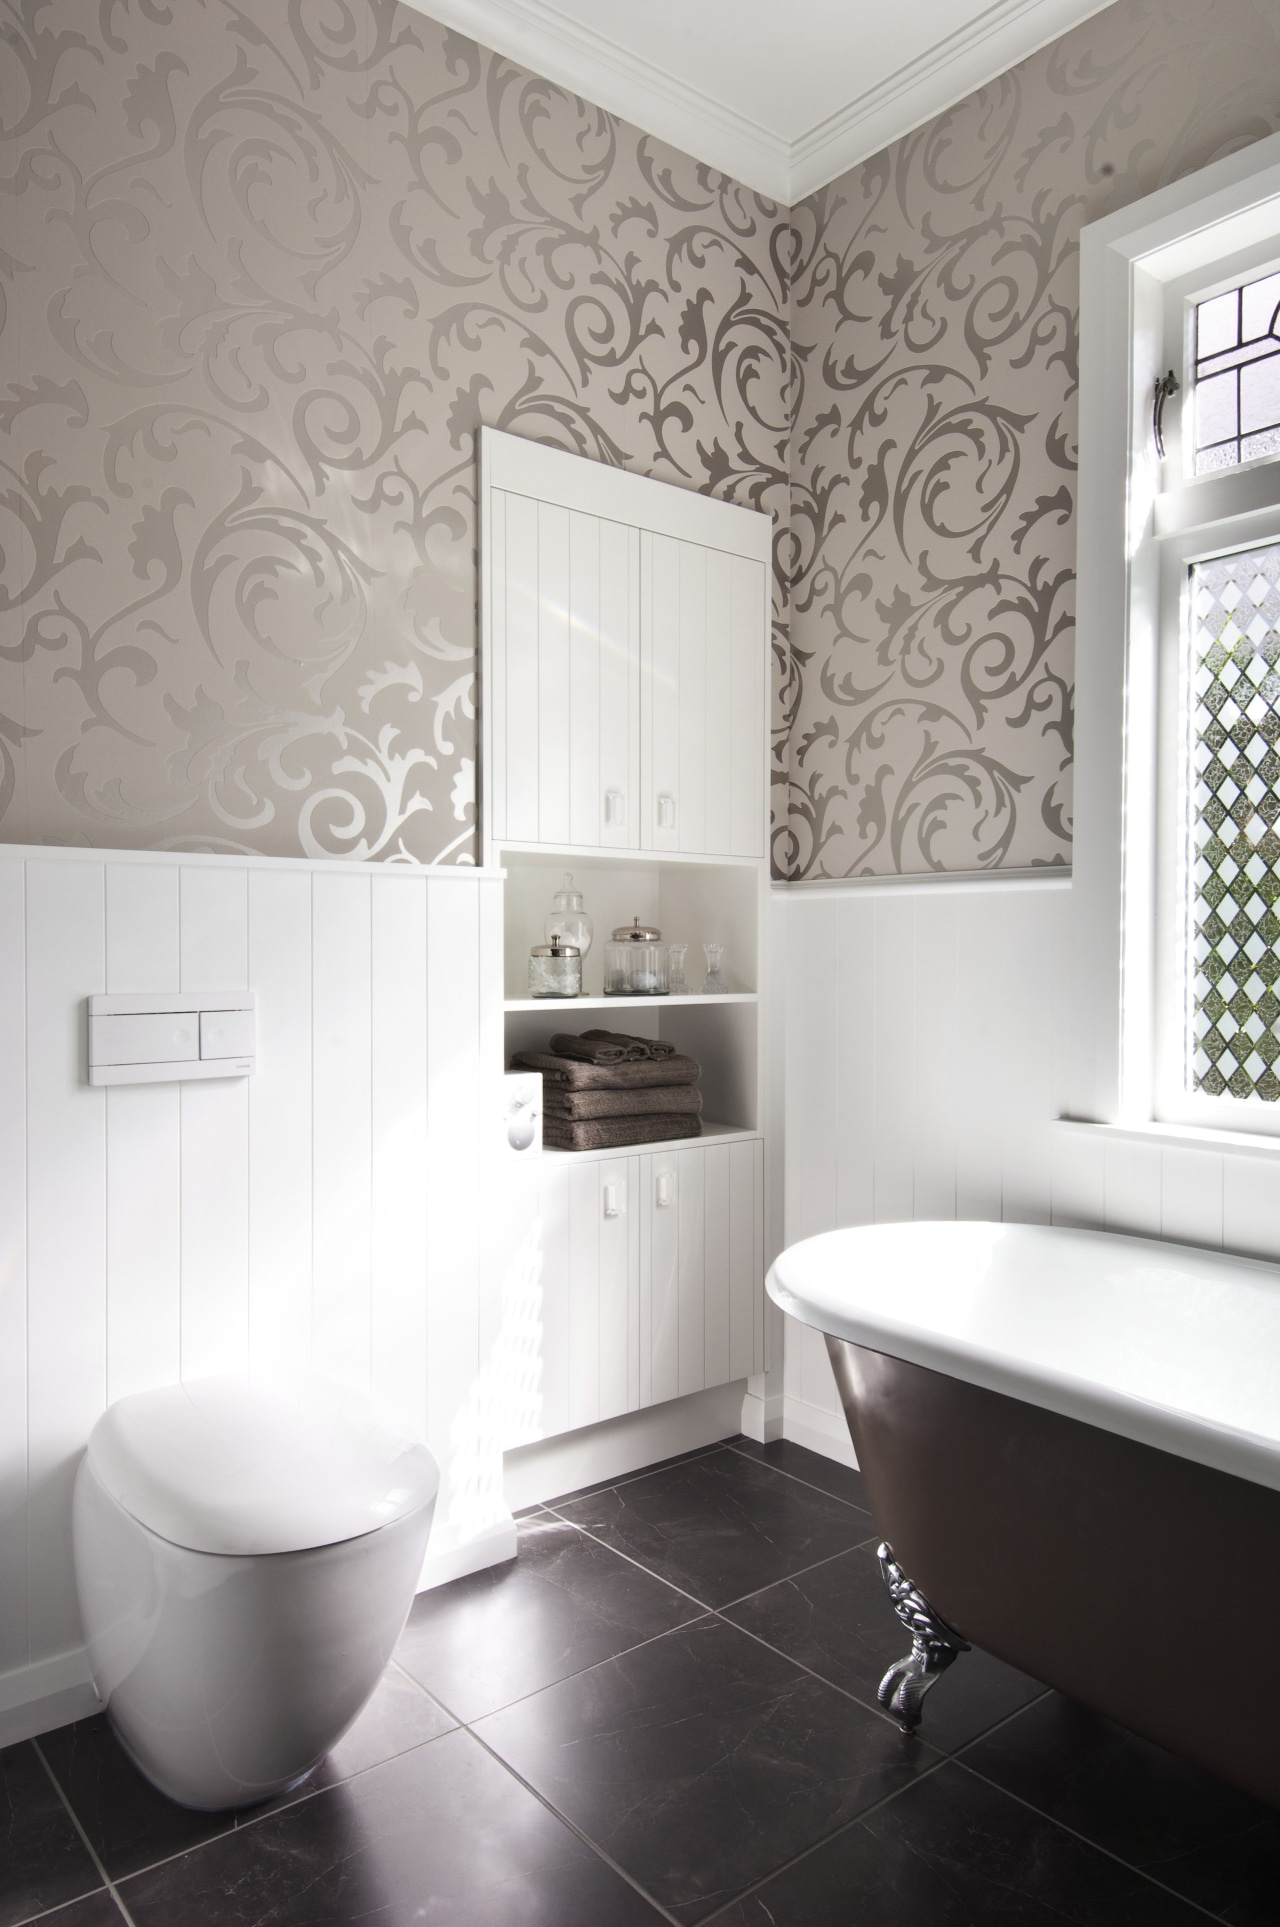 View of bathroom in a 1930s bungalow designed bathroom, bathroom accessory, bidet, ceramic, floor, flooring, interior design, plumbing fixture, product design, room, tap, tile, toilet, toilet seat, wall, window, white, gray